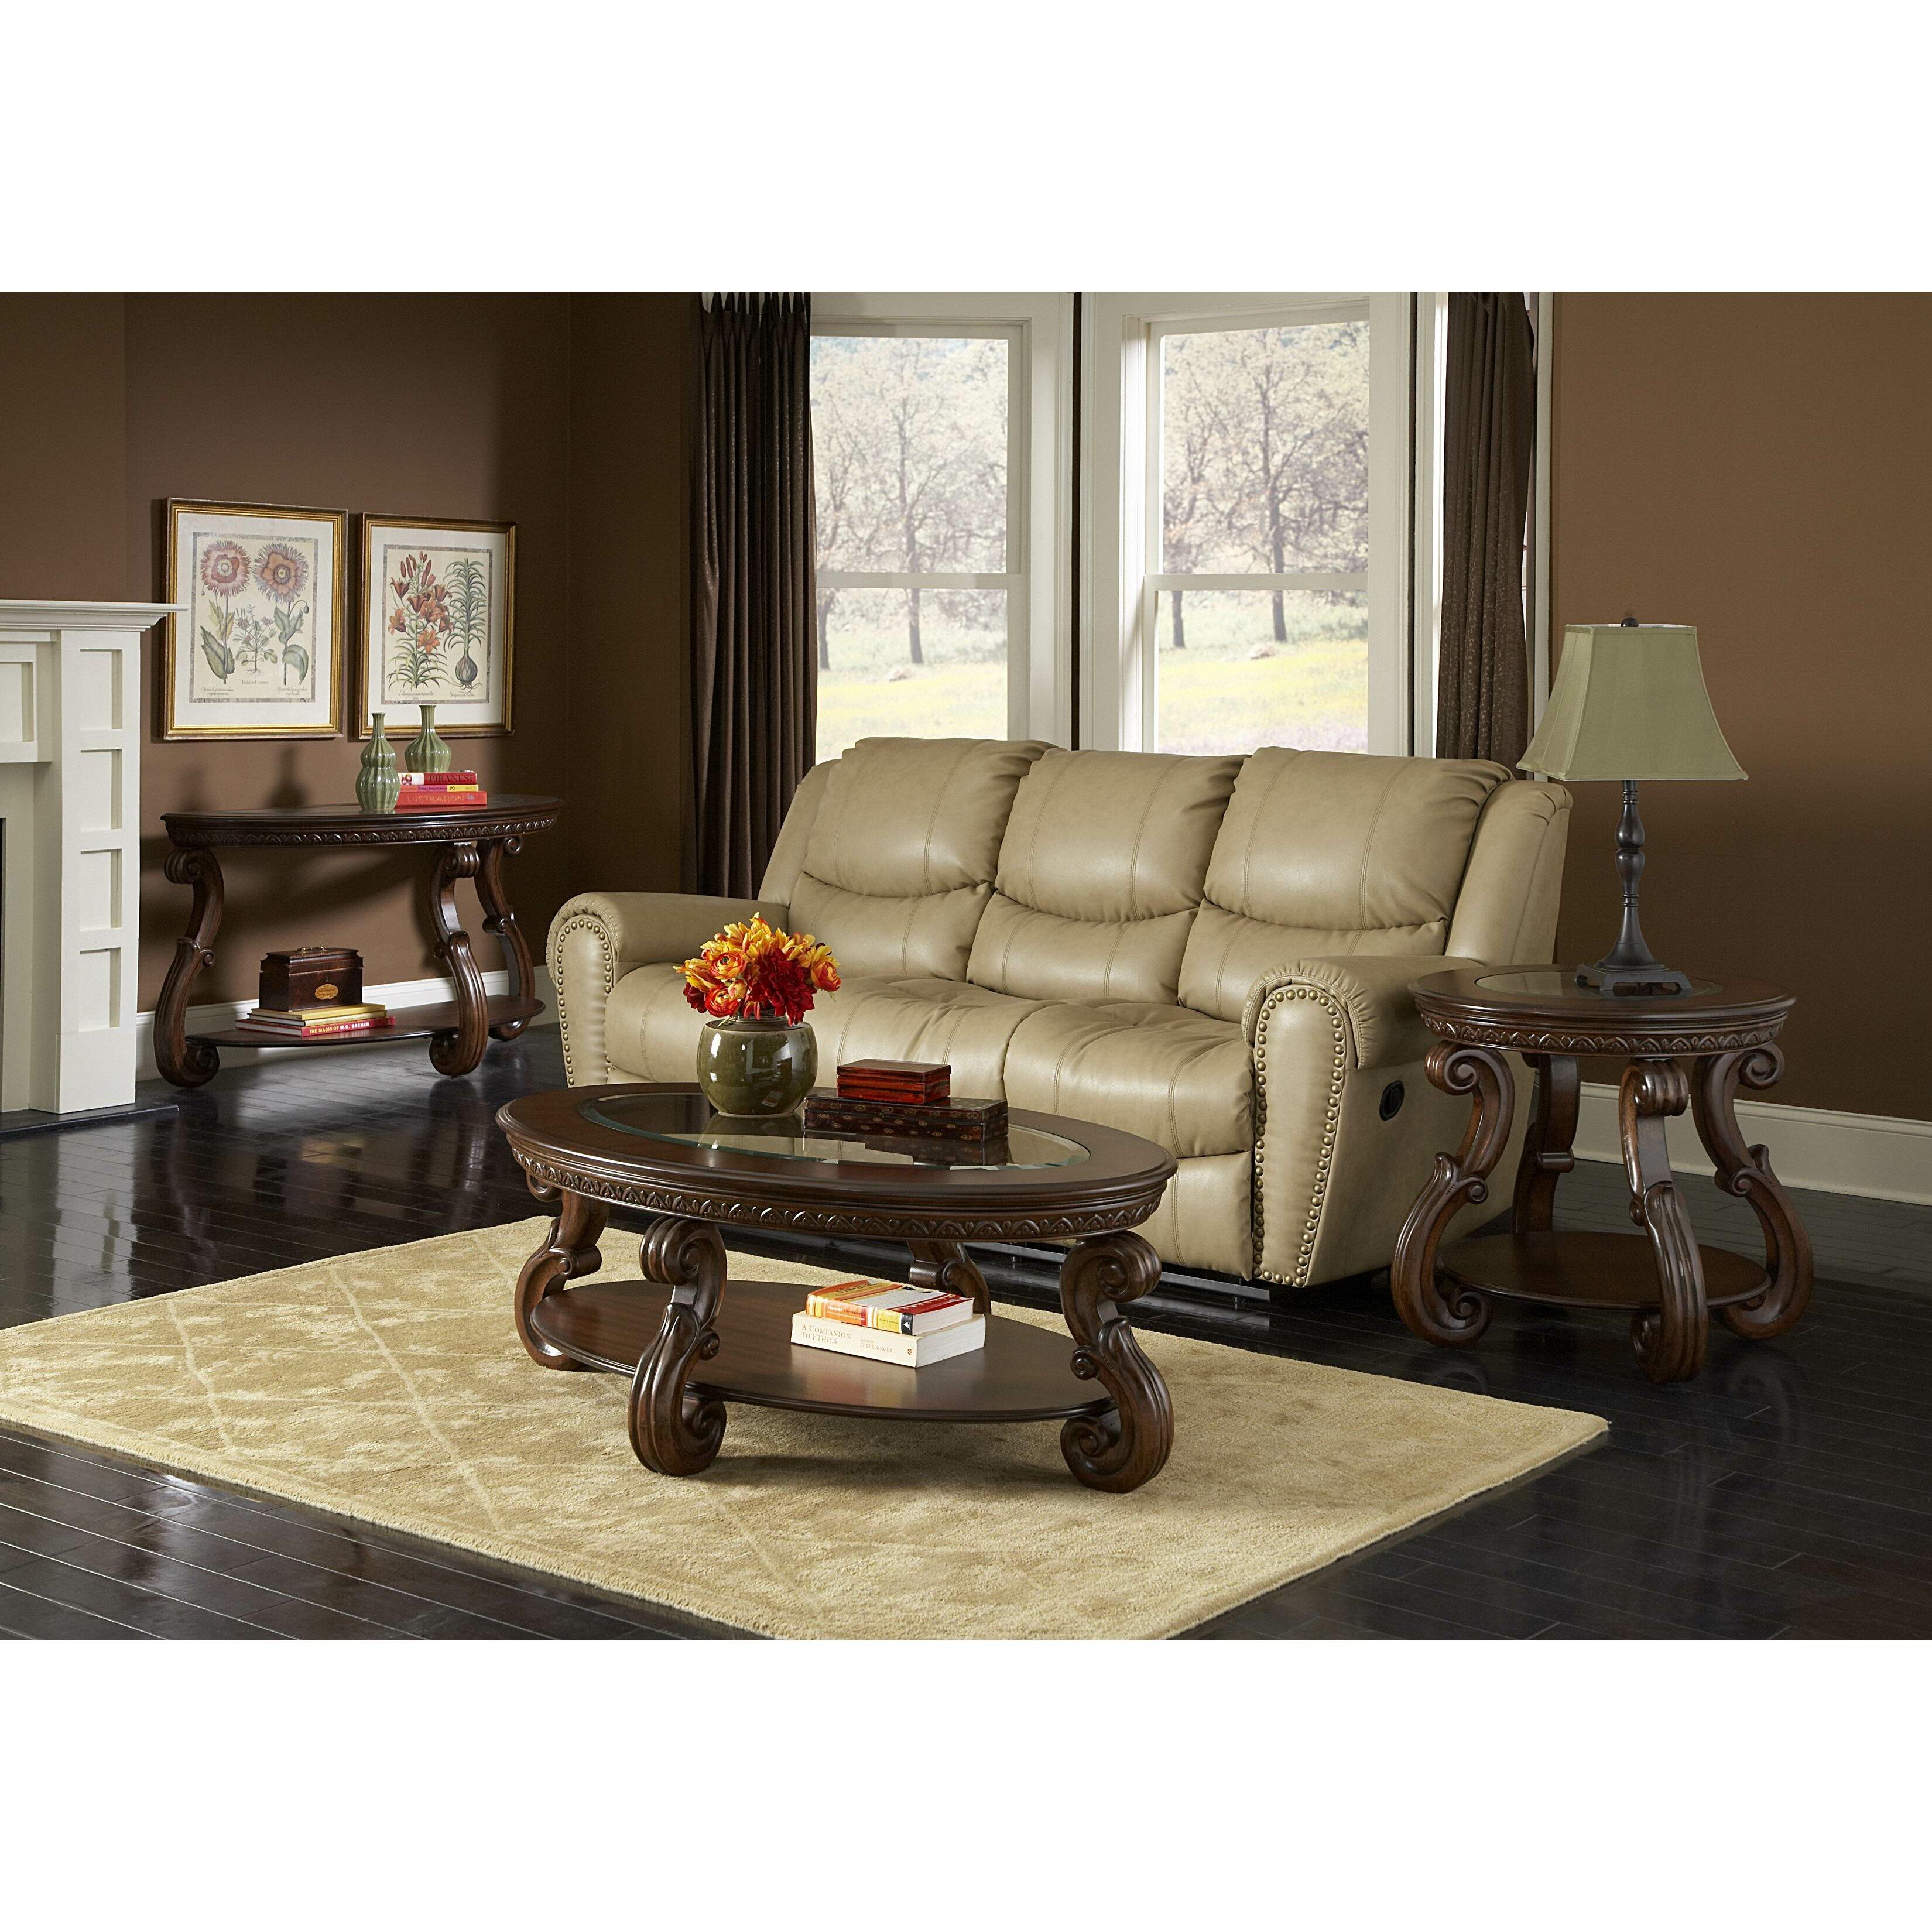 Woodhaven Living Room Furniture Woodhaven Hill 5556 Series Coffee Table Set Reviews Wayfair